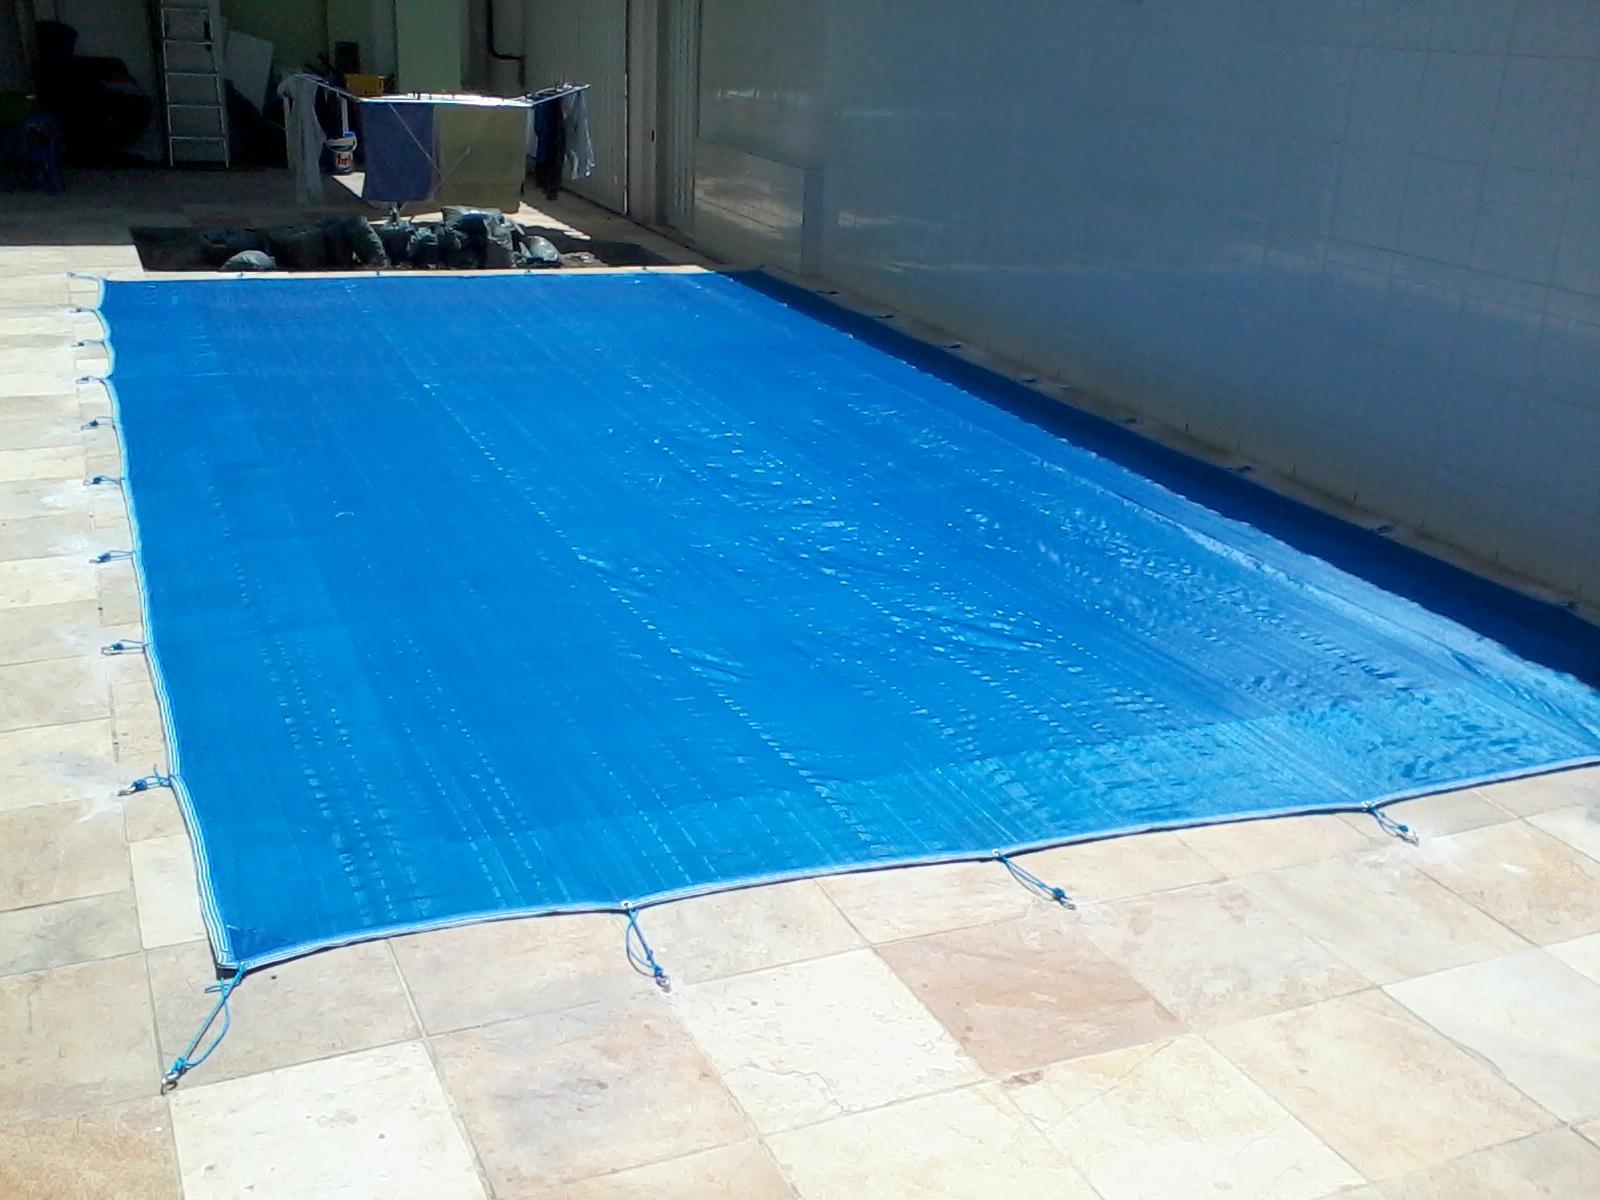 Capas para piscinas no rj capa de piscina - Material para piscinas ...